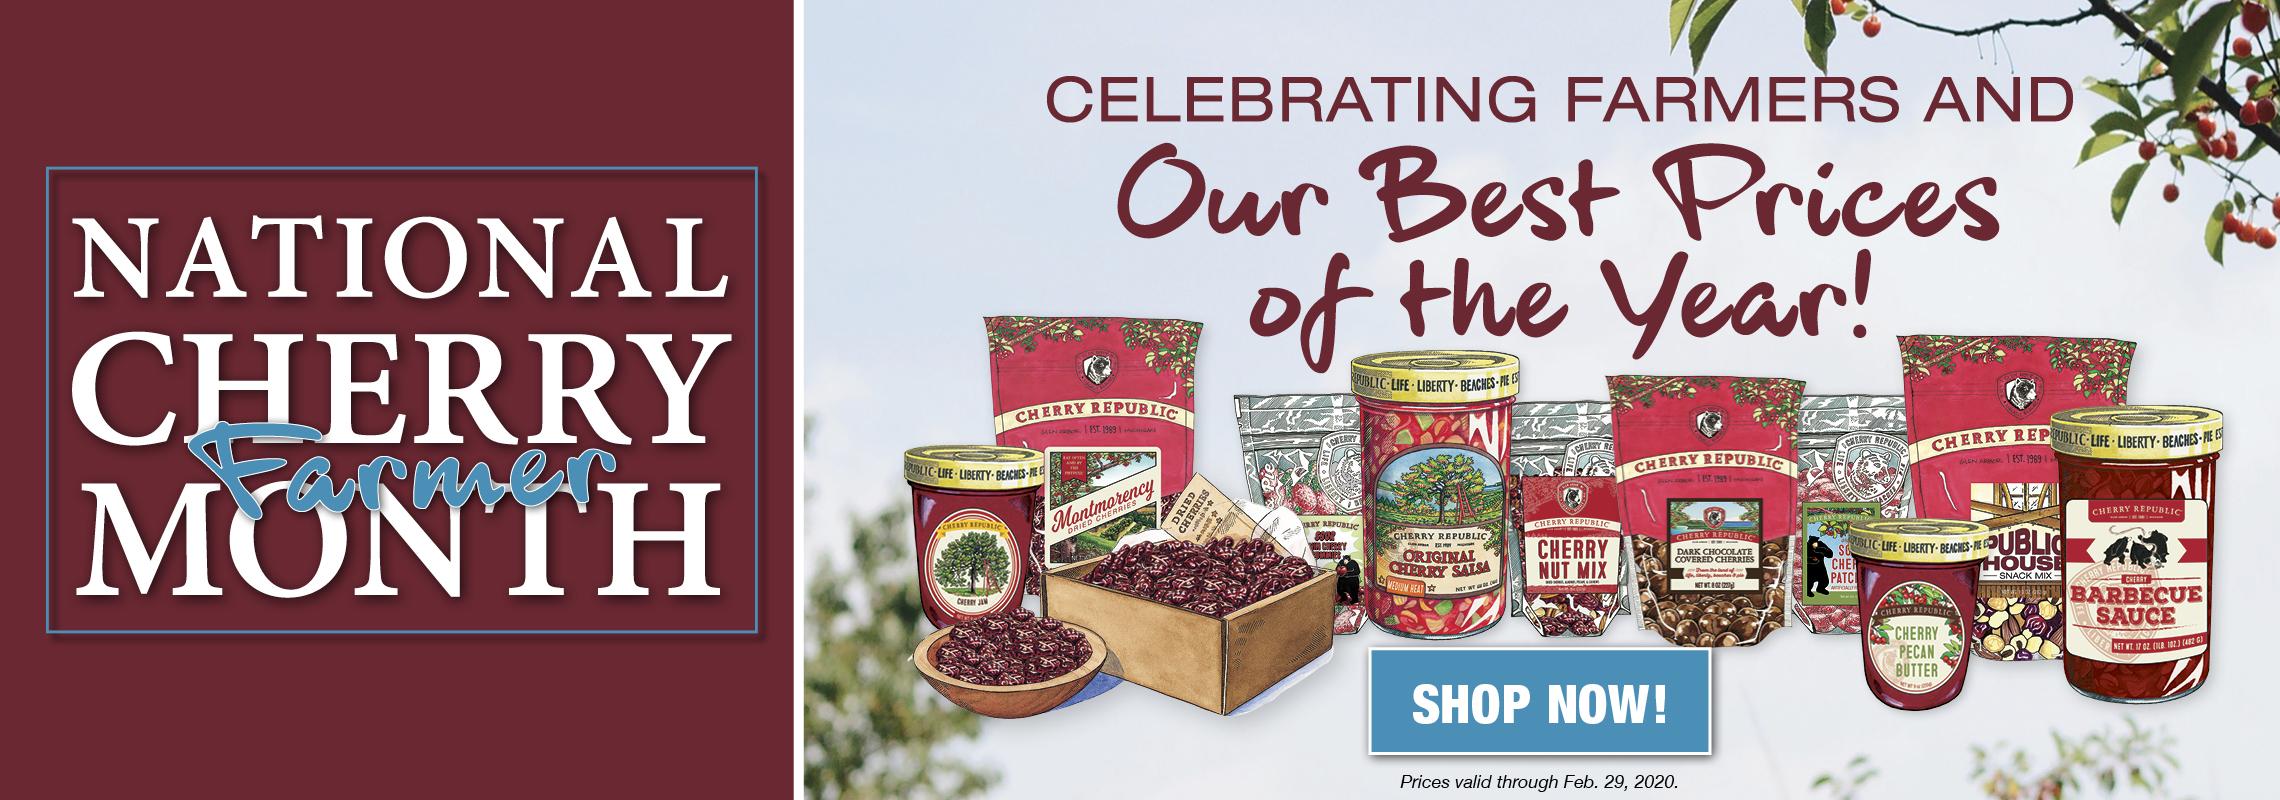 National Cherry Farmer Month